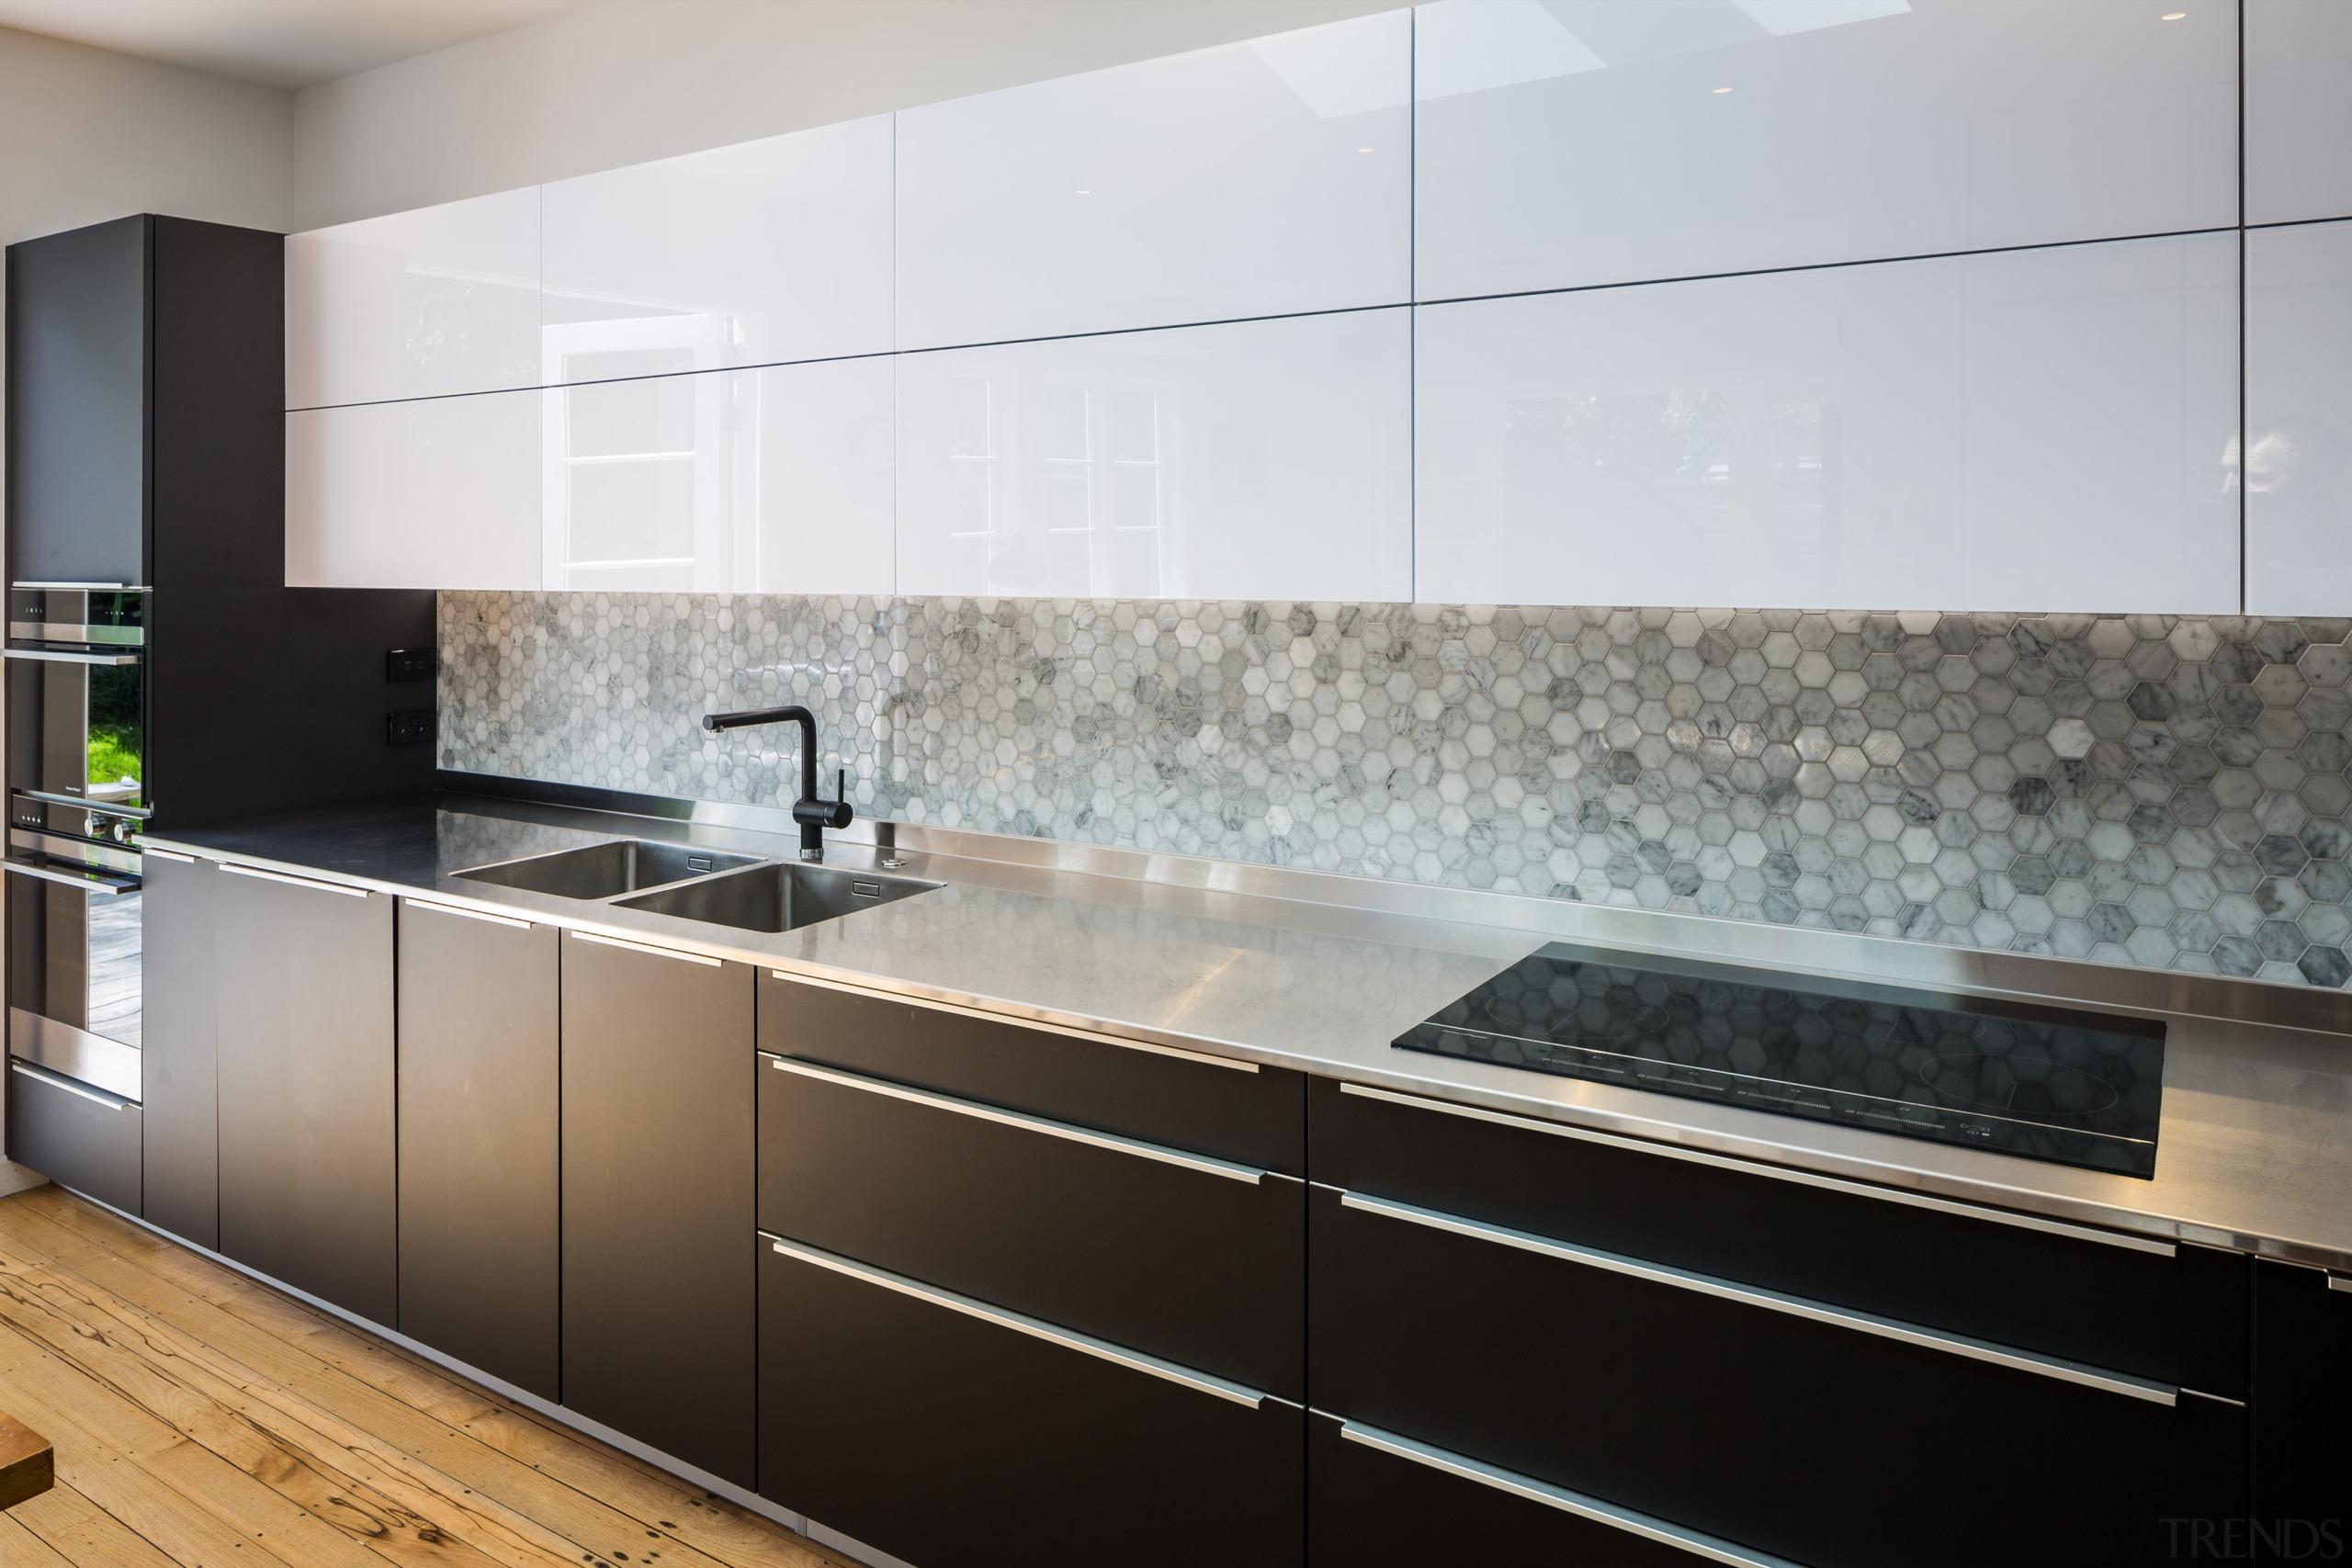 Hexagonal tiles make up the long splashback - cabinetry, countertop, floor, interior design, kitchen, product design, gray, black, white